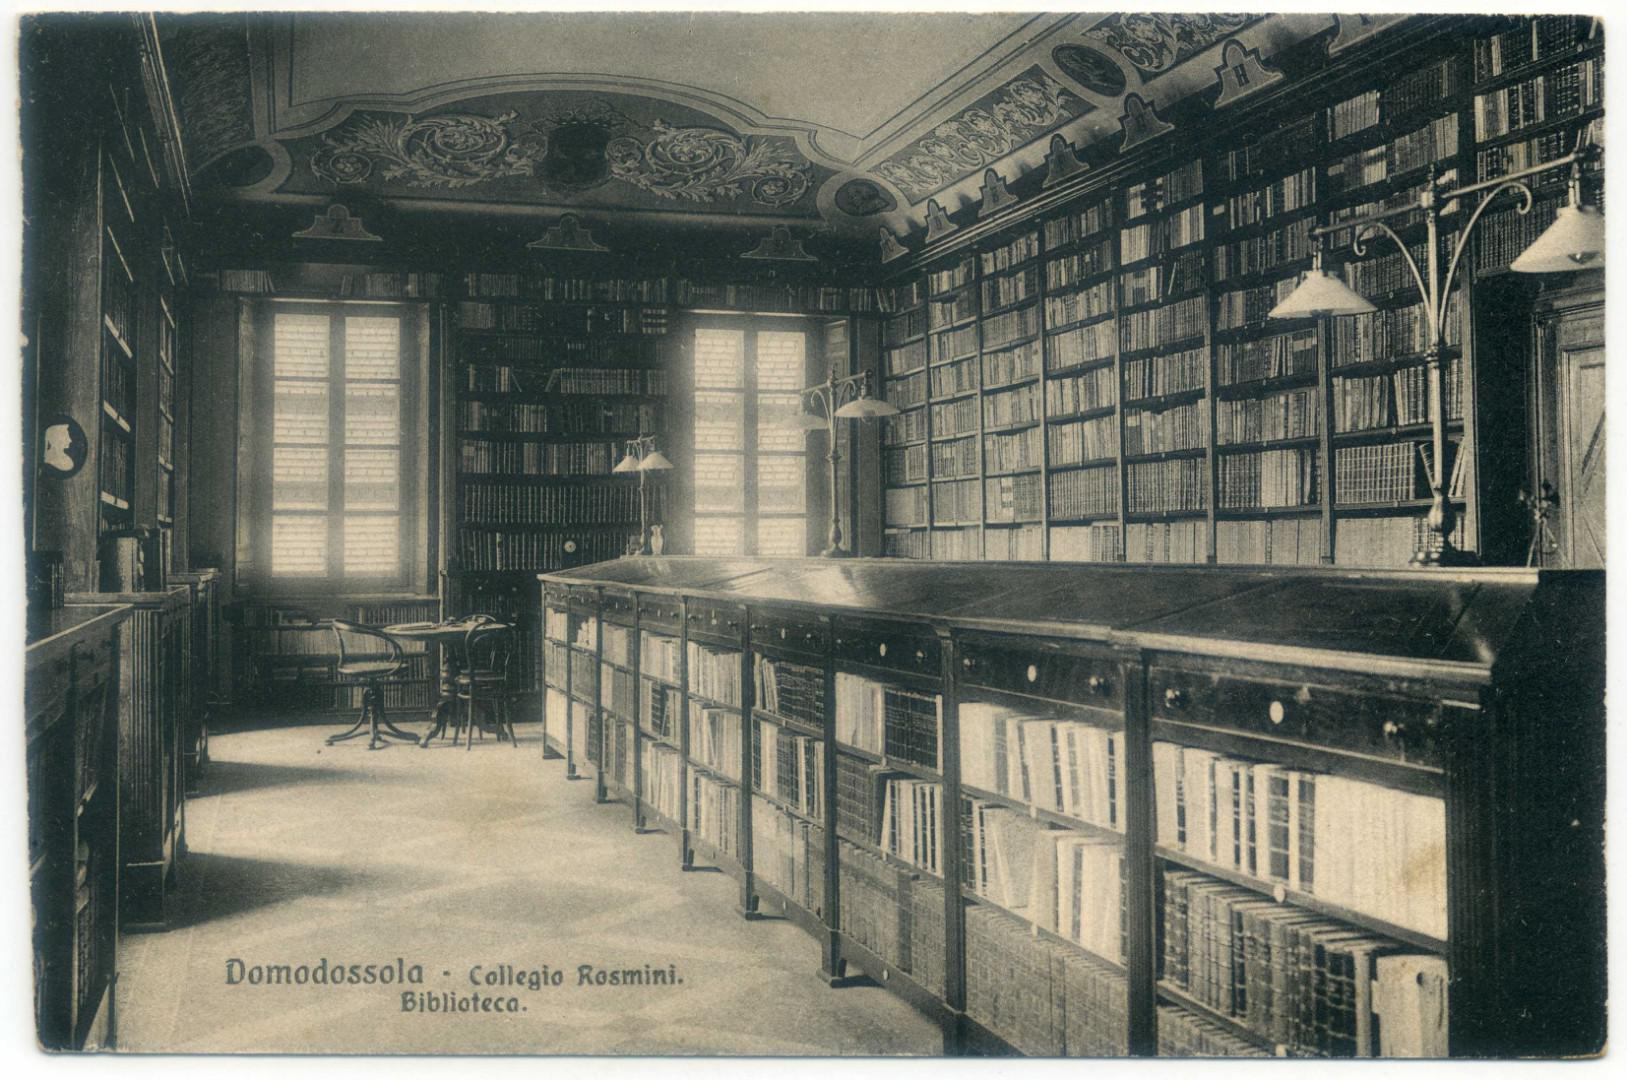 Domodossola: Collegio Mellerio-Rosmini, Biblioteca (Sala Gaddo)